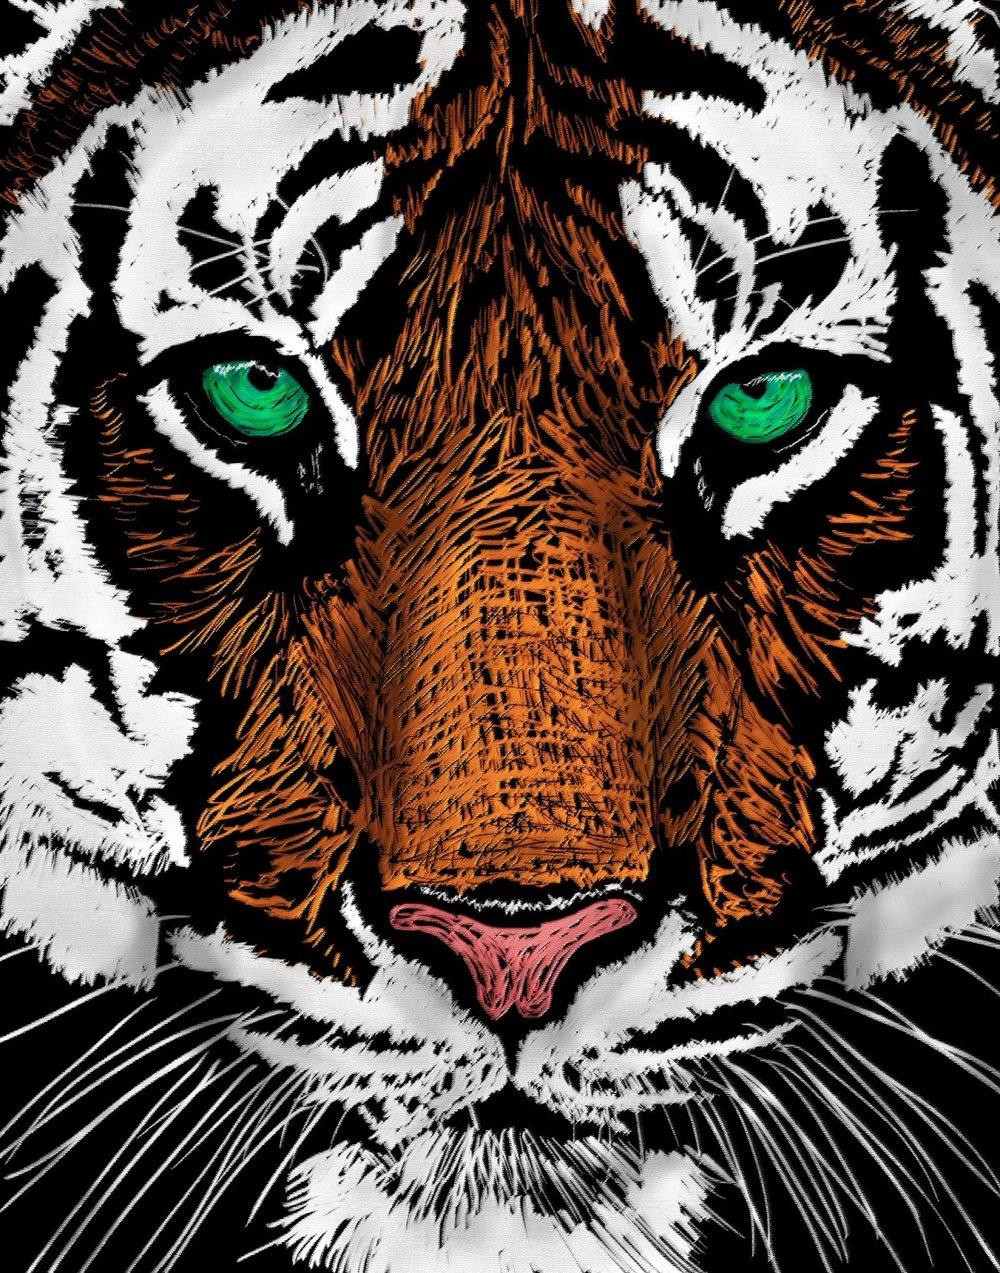 Tiger photoshopped.jpg